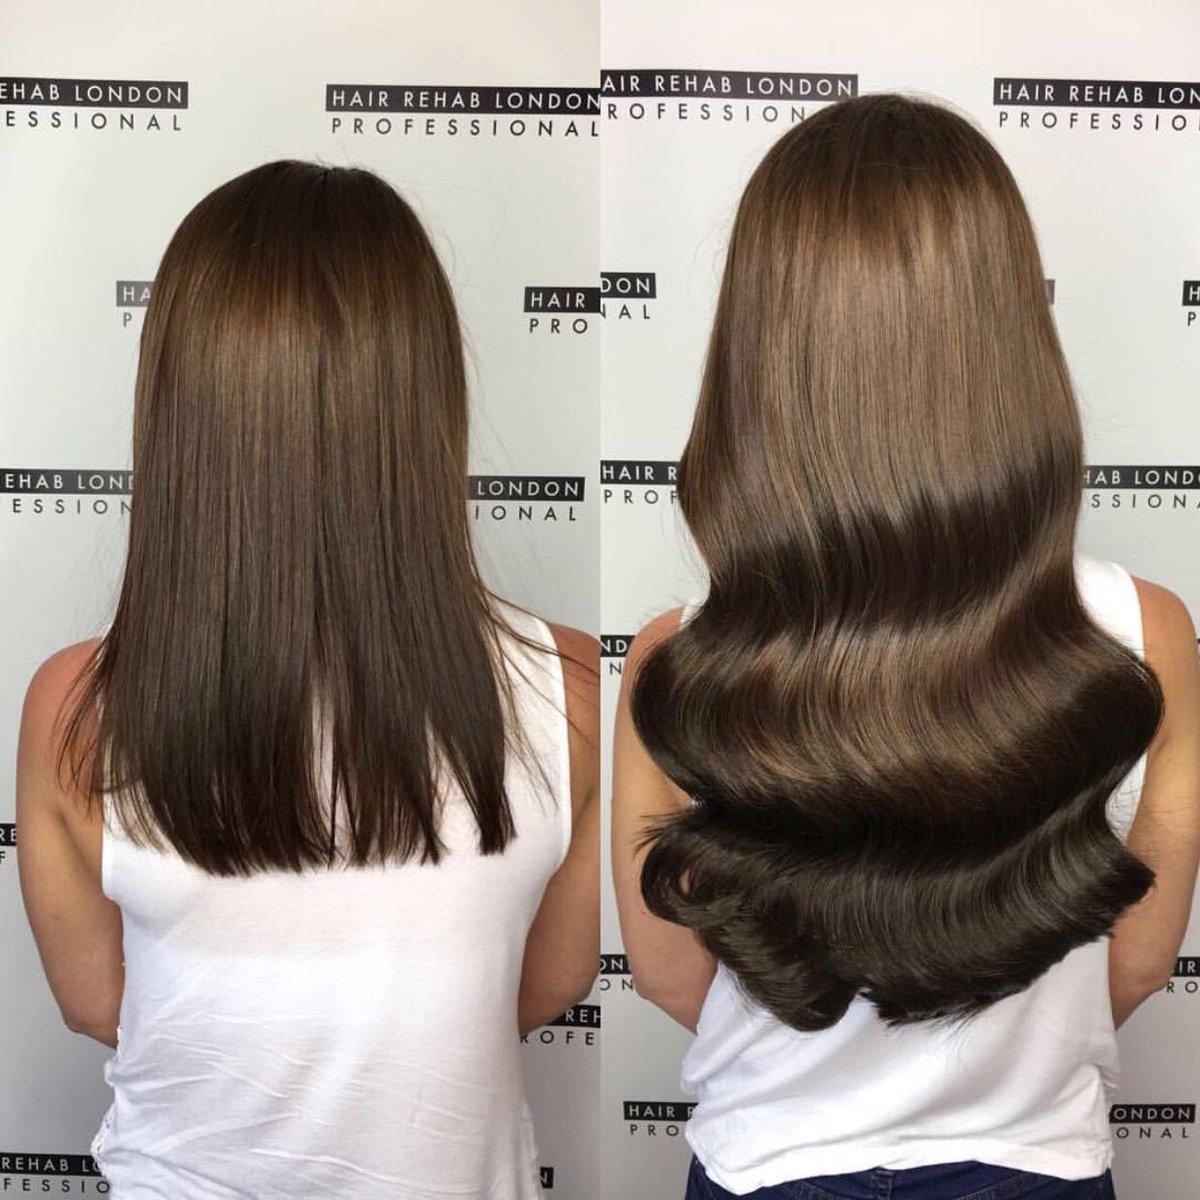 Hair Rehab London On Twitter S E A M L E S S Leighgrant89